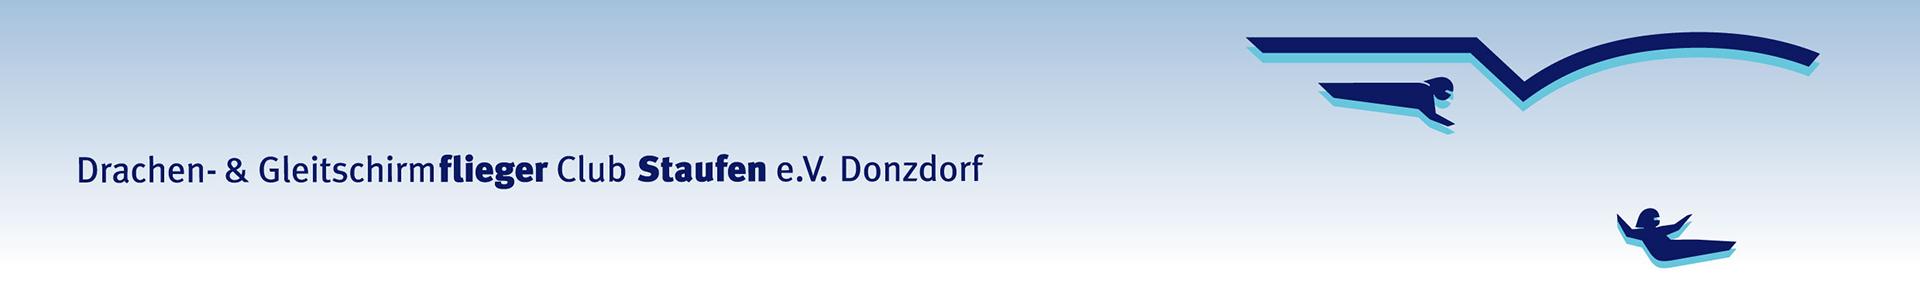 Drachen- & Gleitschirmflieger Club Messelberg-Flieger DGCS